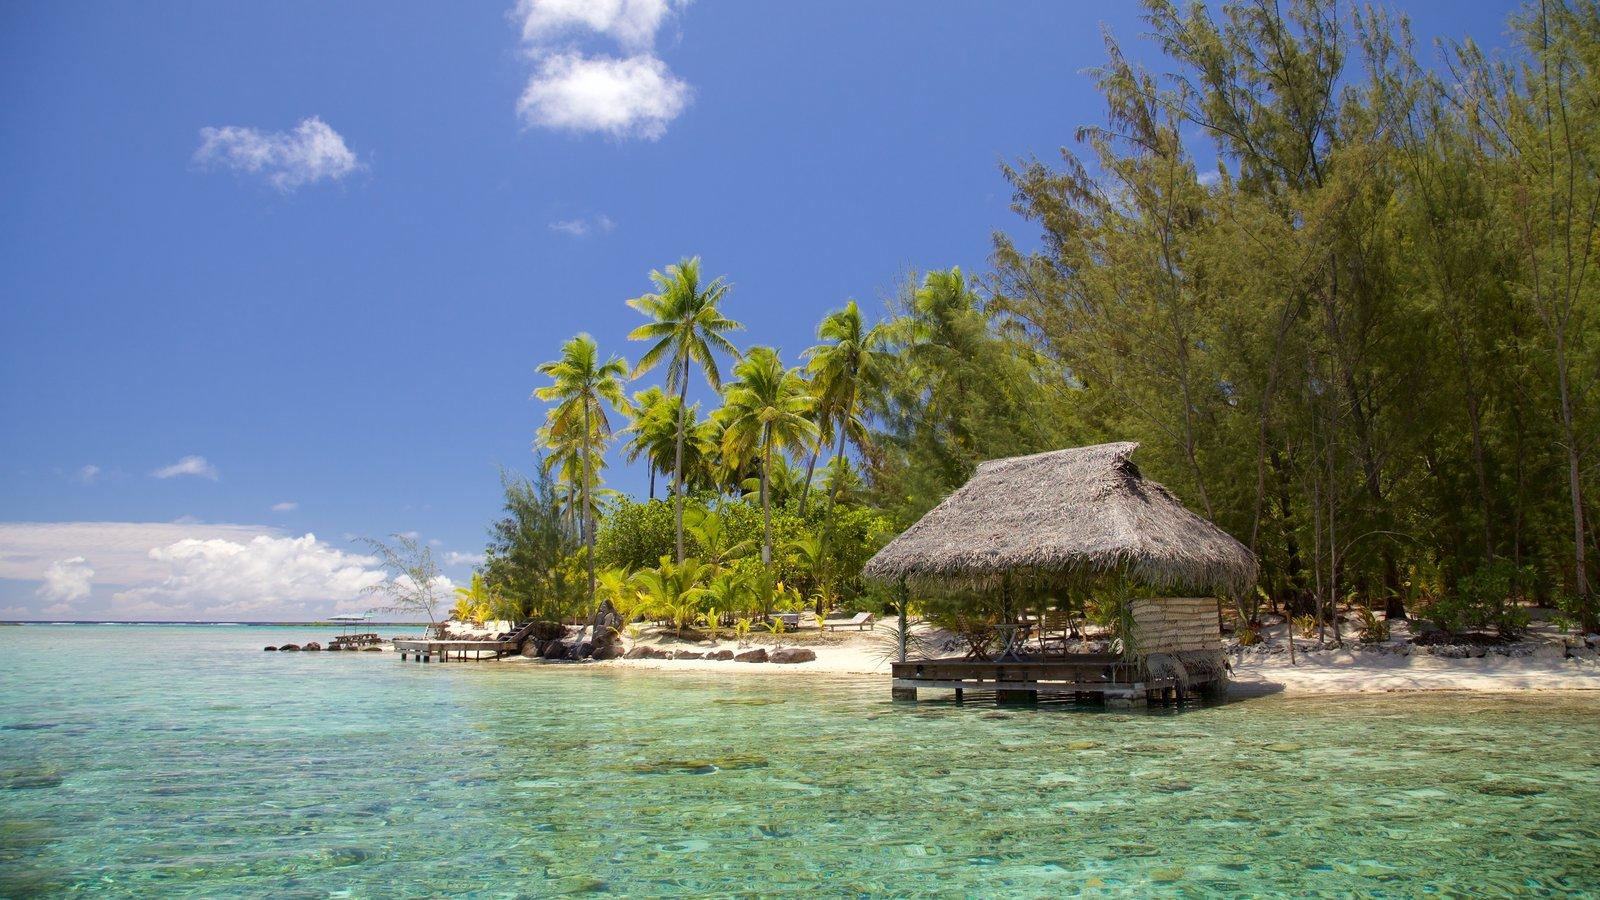 Bora Bora featuring general coastal views and tropical scenes